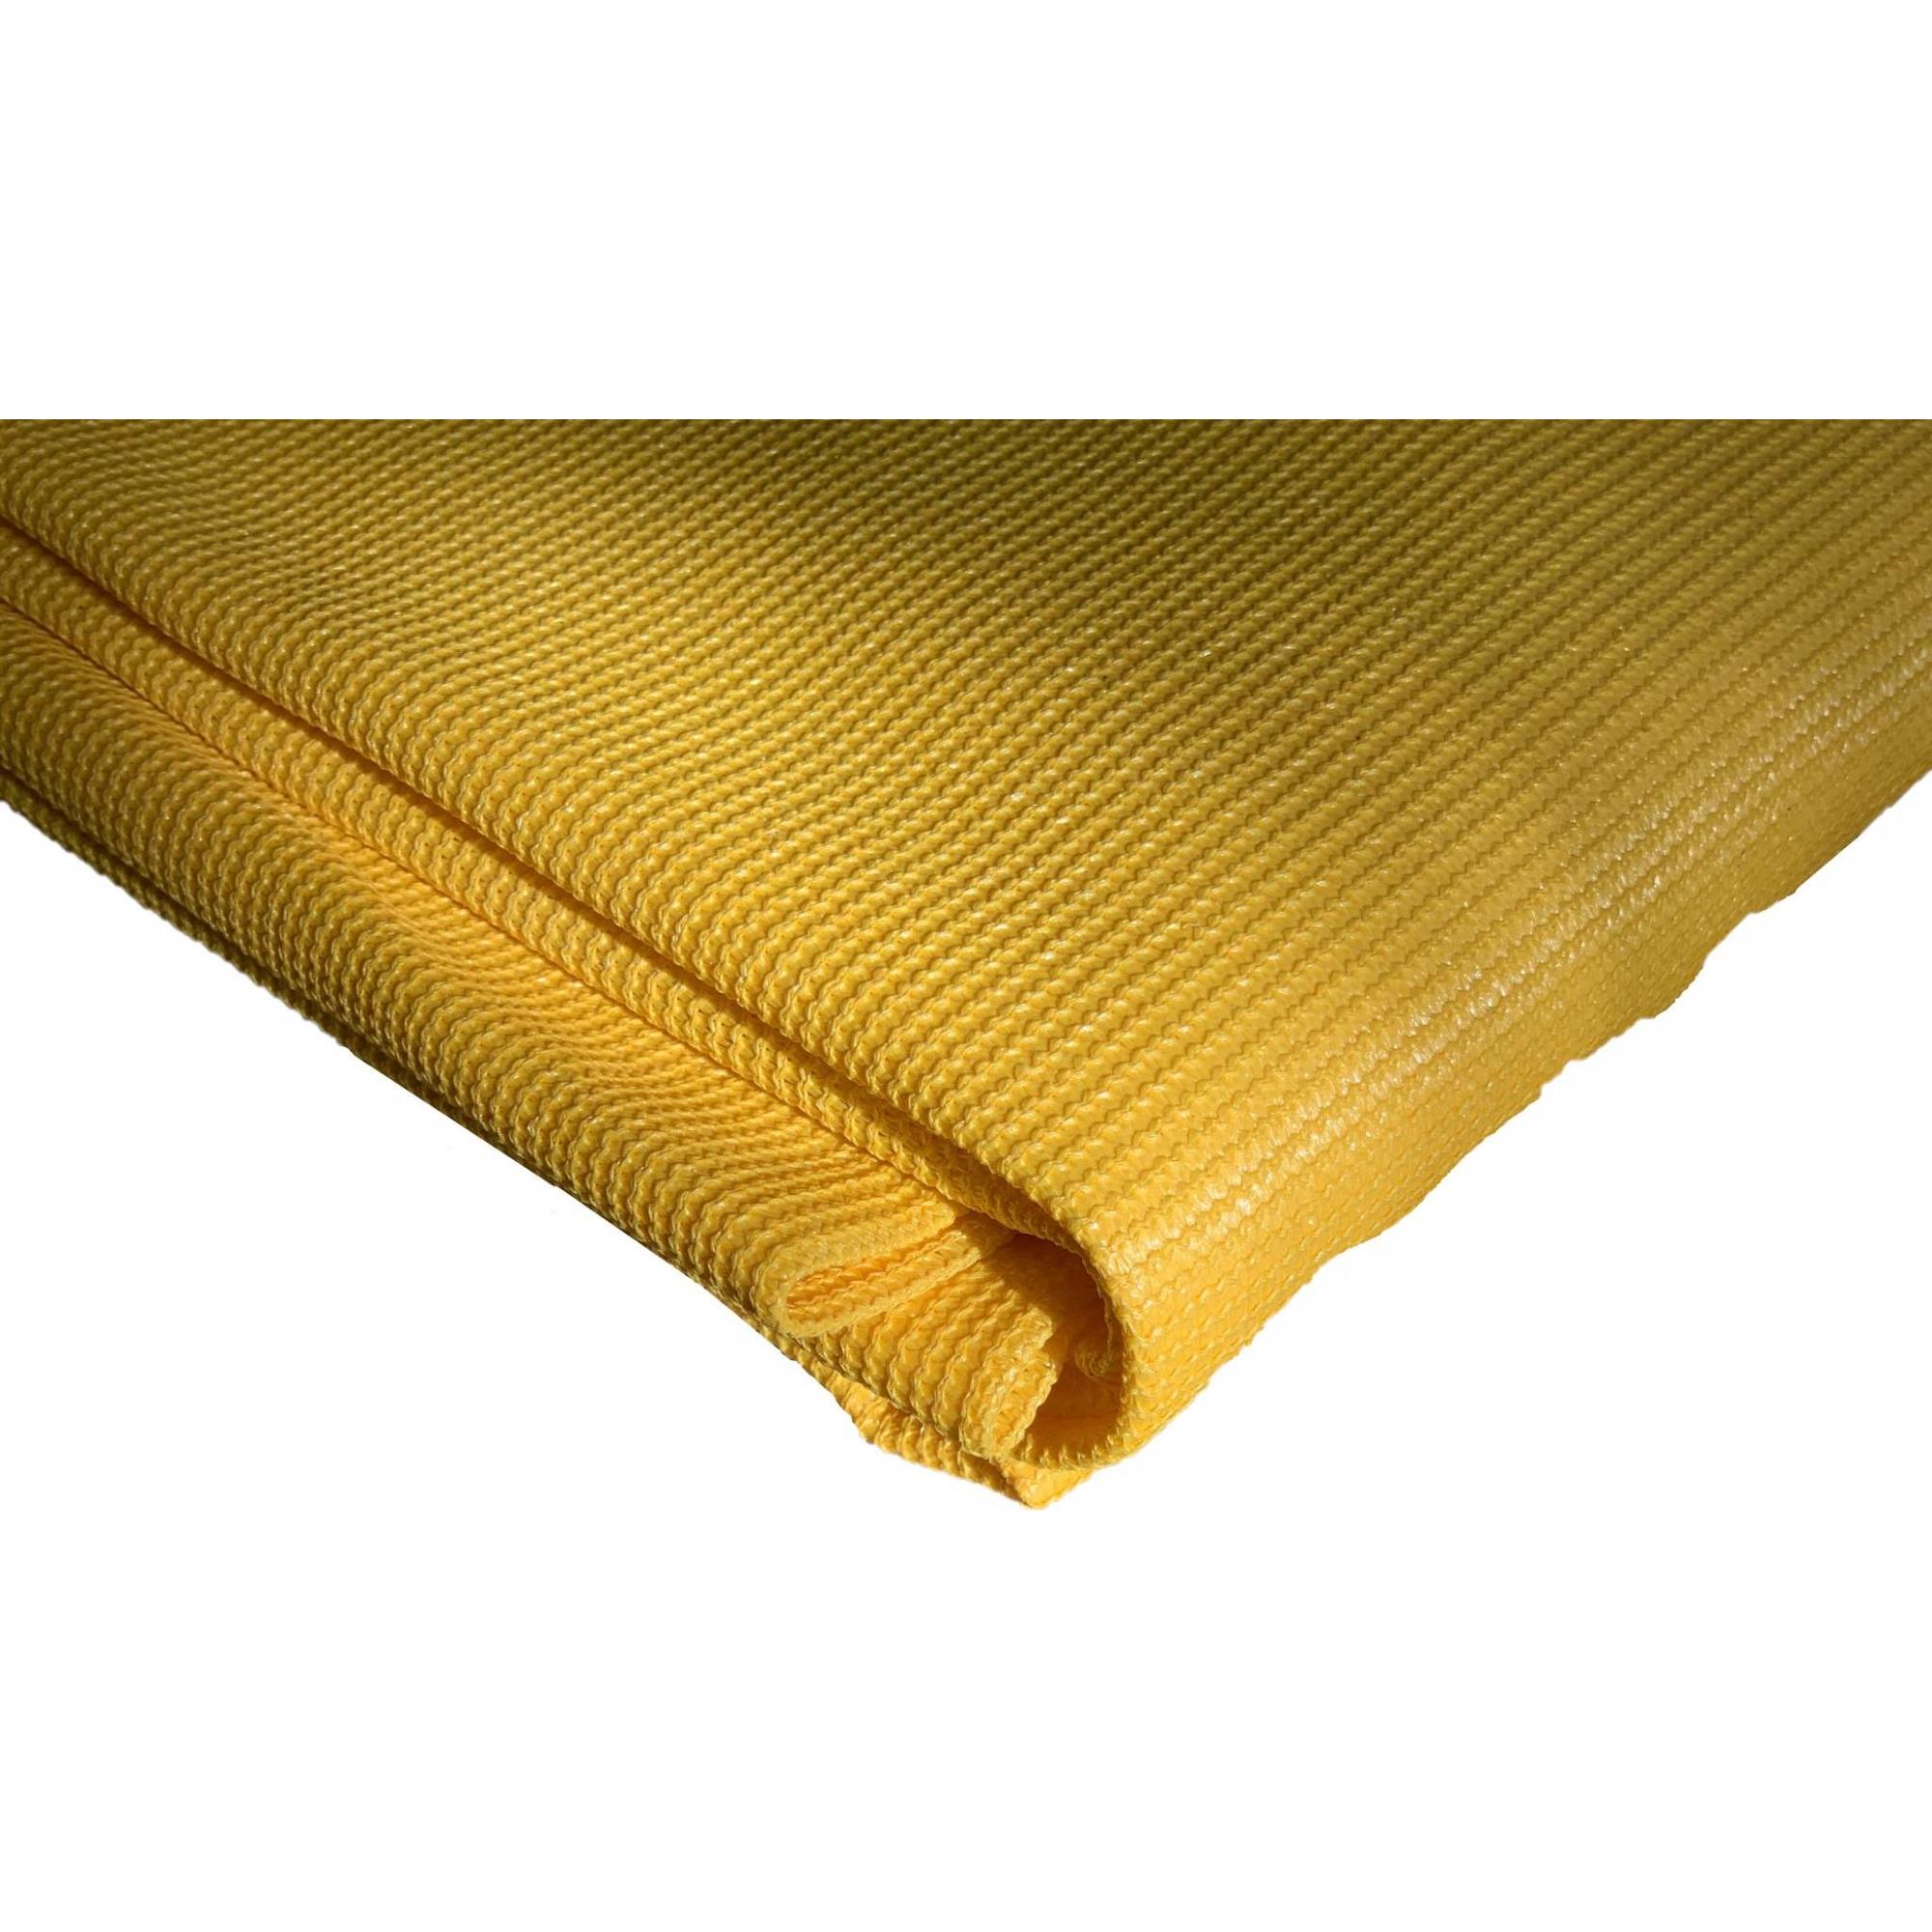 Tela De Sombreamento Decorativa Amarela 90% - 5,2 Metros X 10 Metros